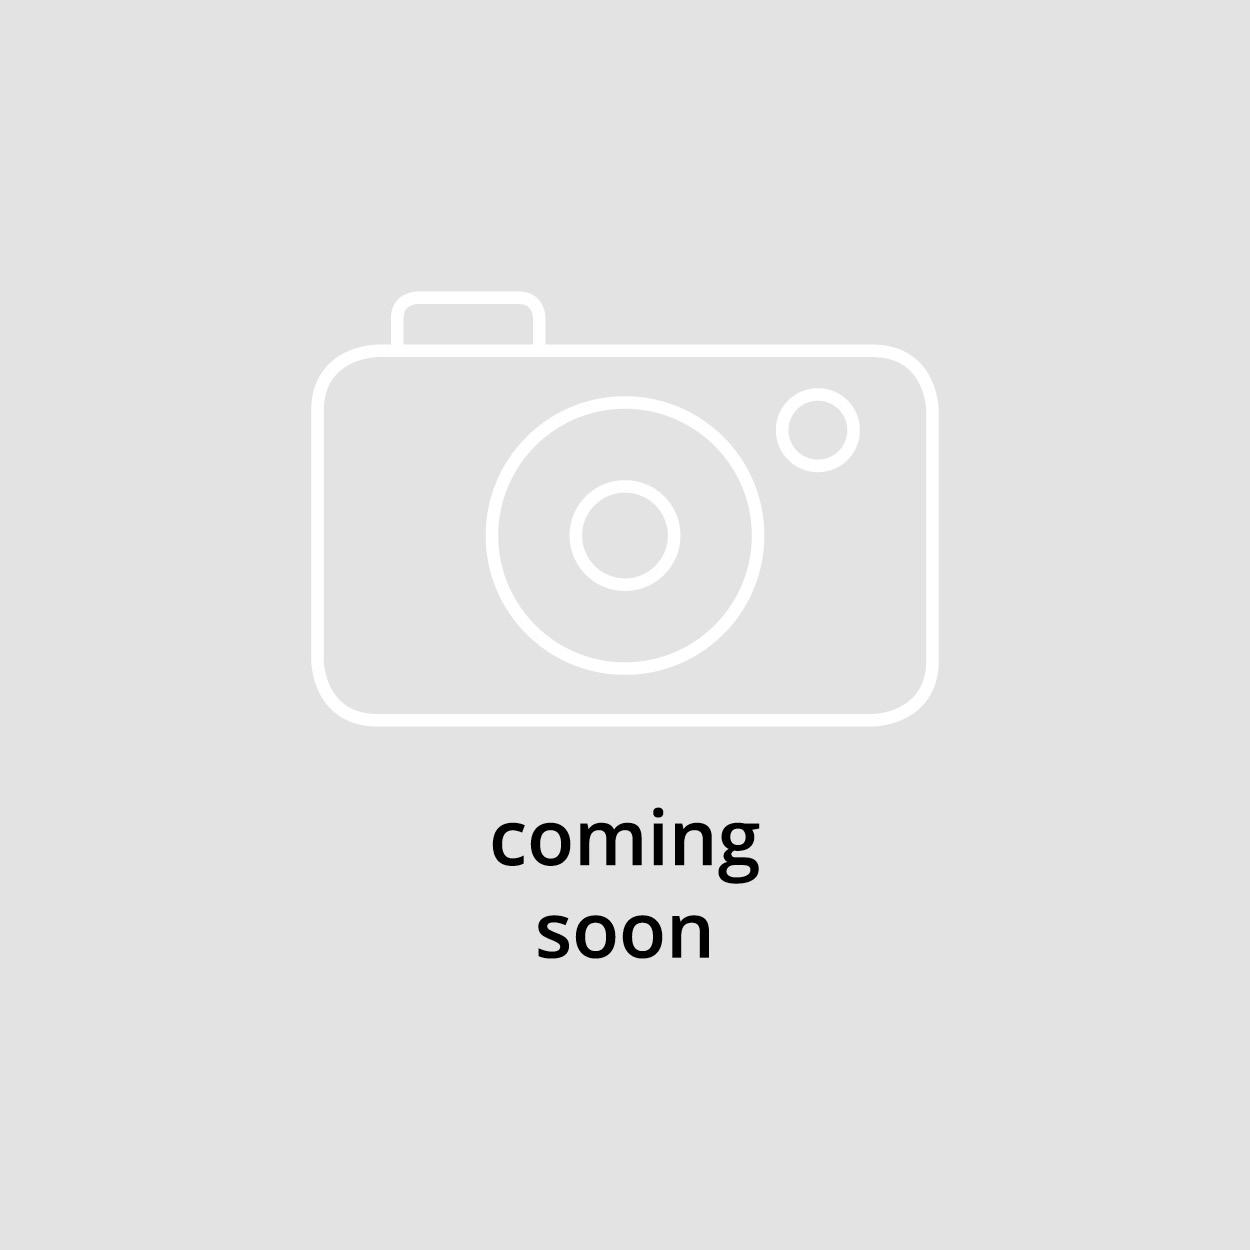 08.18.008 Molla per Portabarre Gildemeister AS16, AS20, GS20, GM20, GM20AC